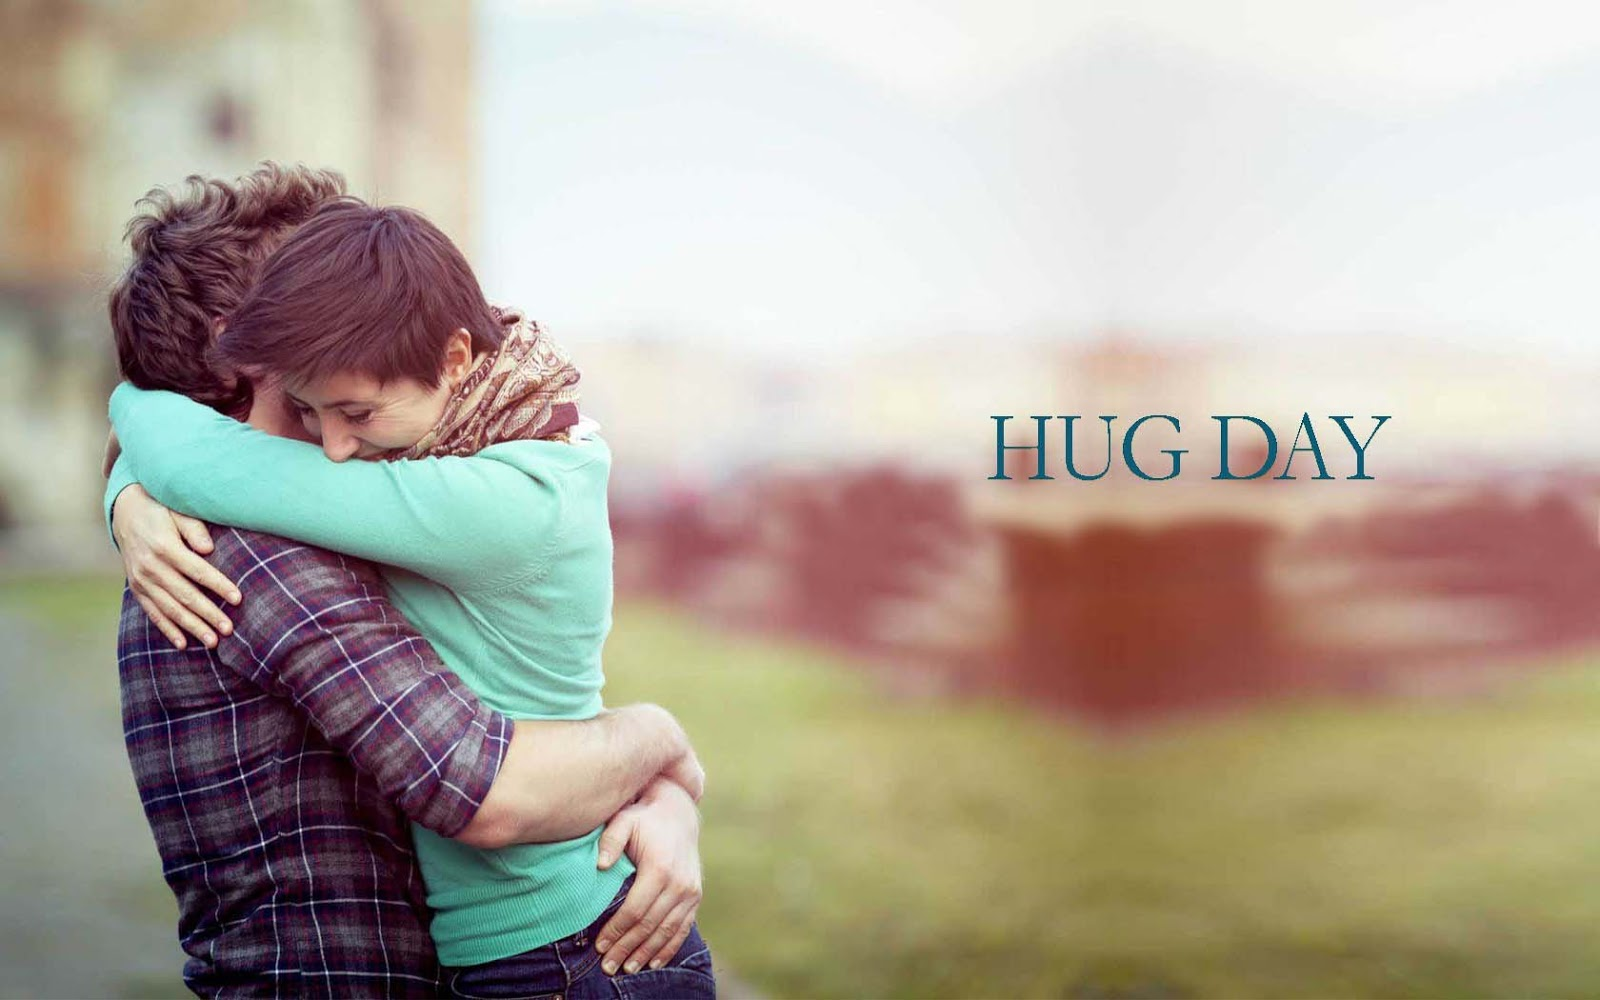 12th Feb Happy Hug Day Allfreshwallpaper